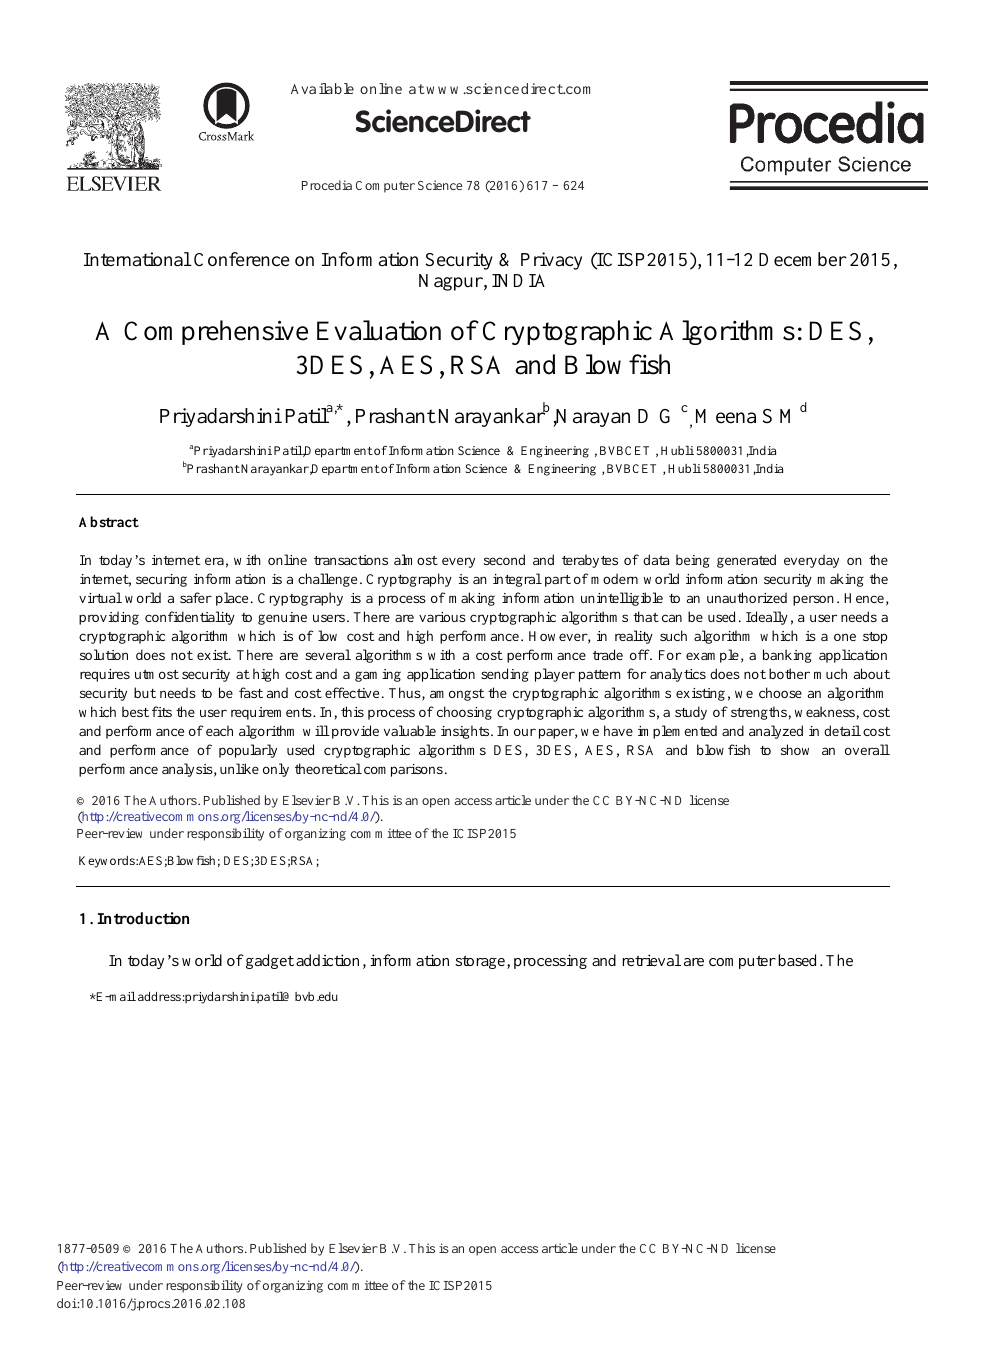 A Comprehensive Evaluation of Cryptographic Algorithms: DES